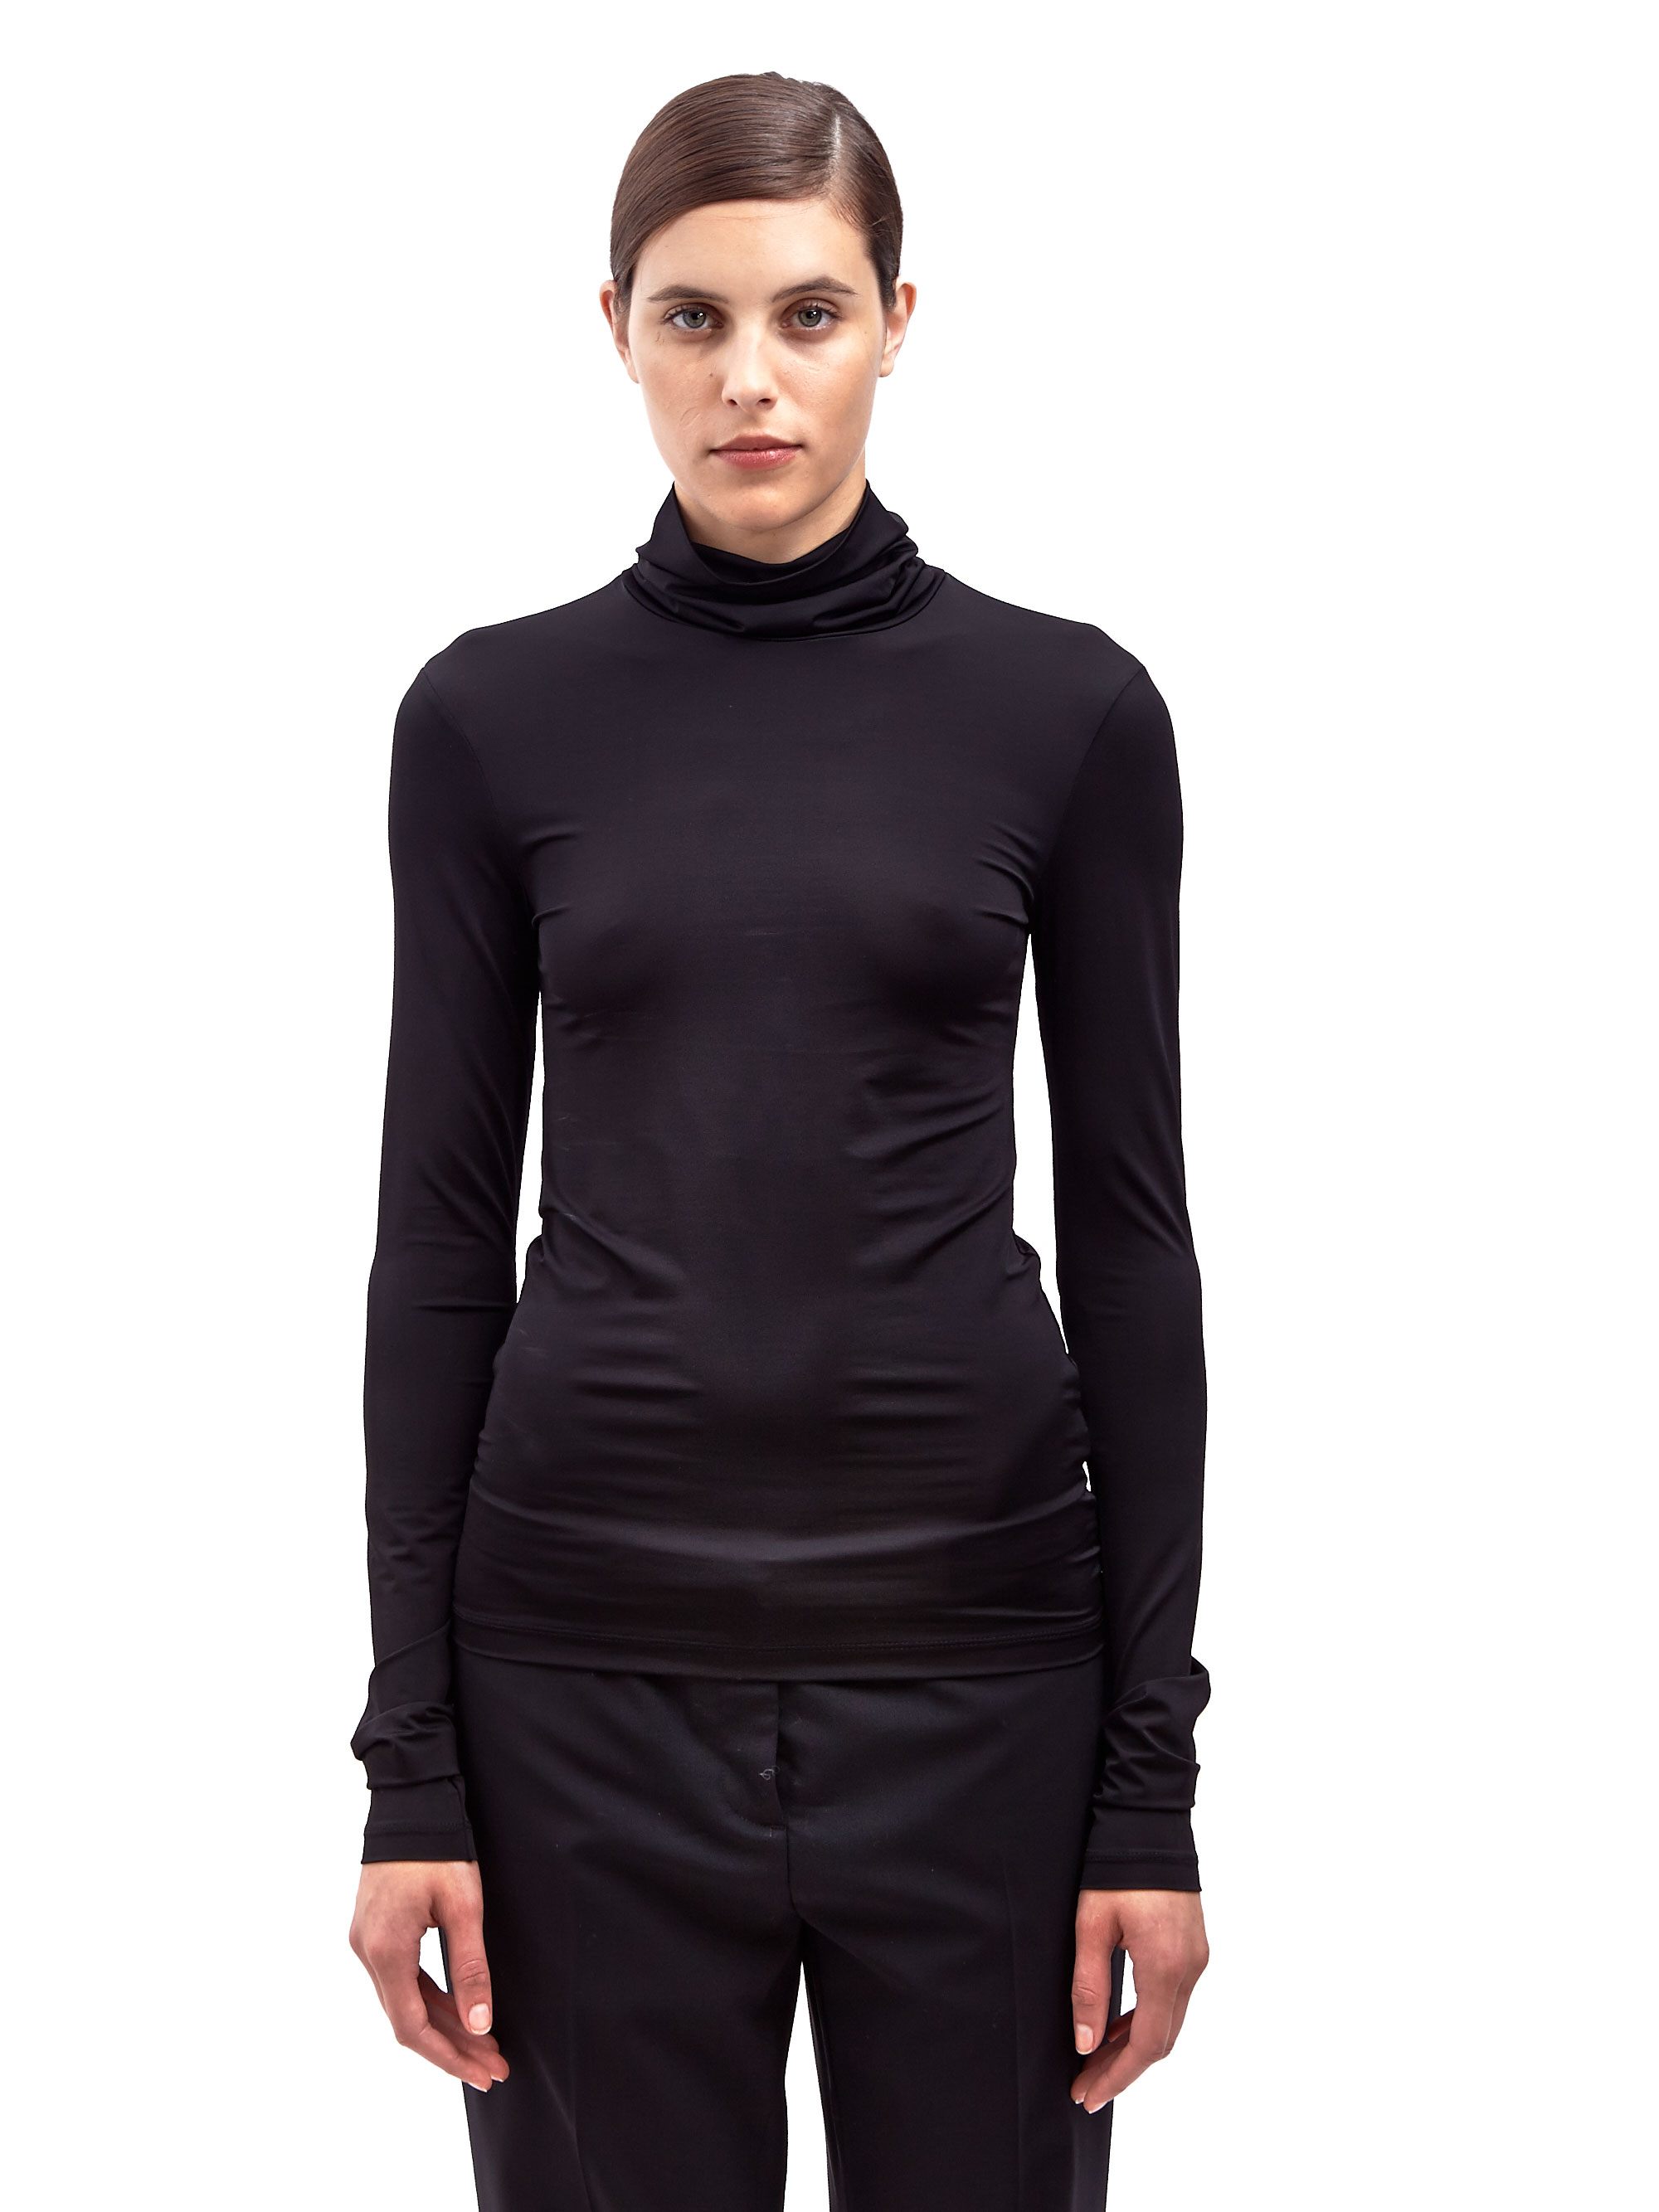 Acne Studios Womens Valeria Shiny Long Sleeved High Neck Top in Black